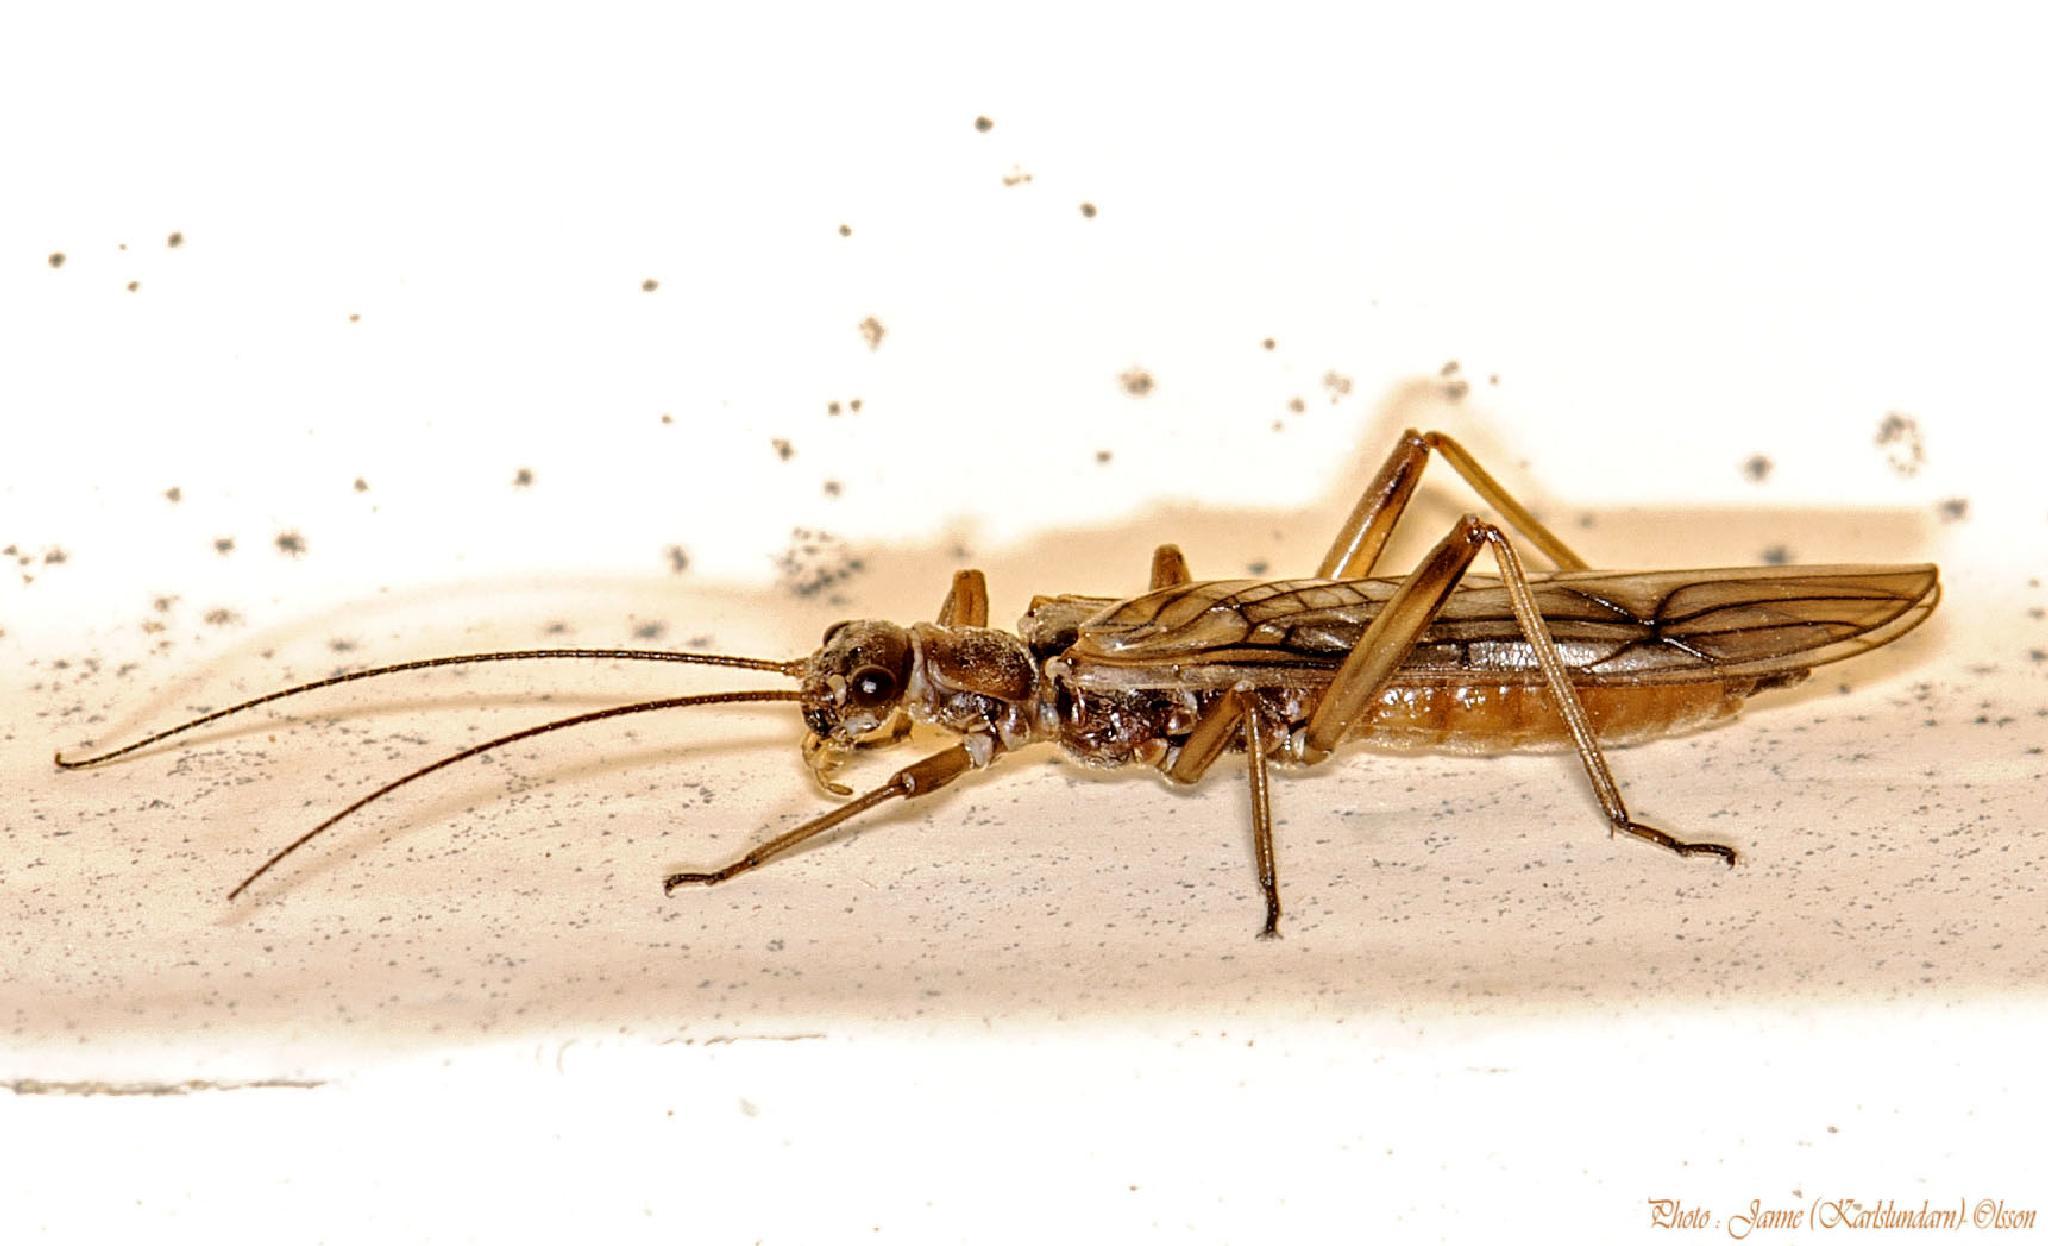 Bäckslända (Plecoptera) by (Karlslundarn)